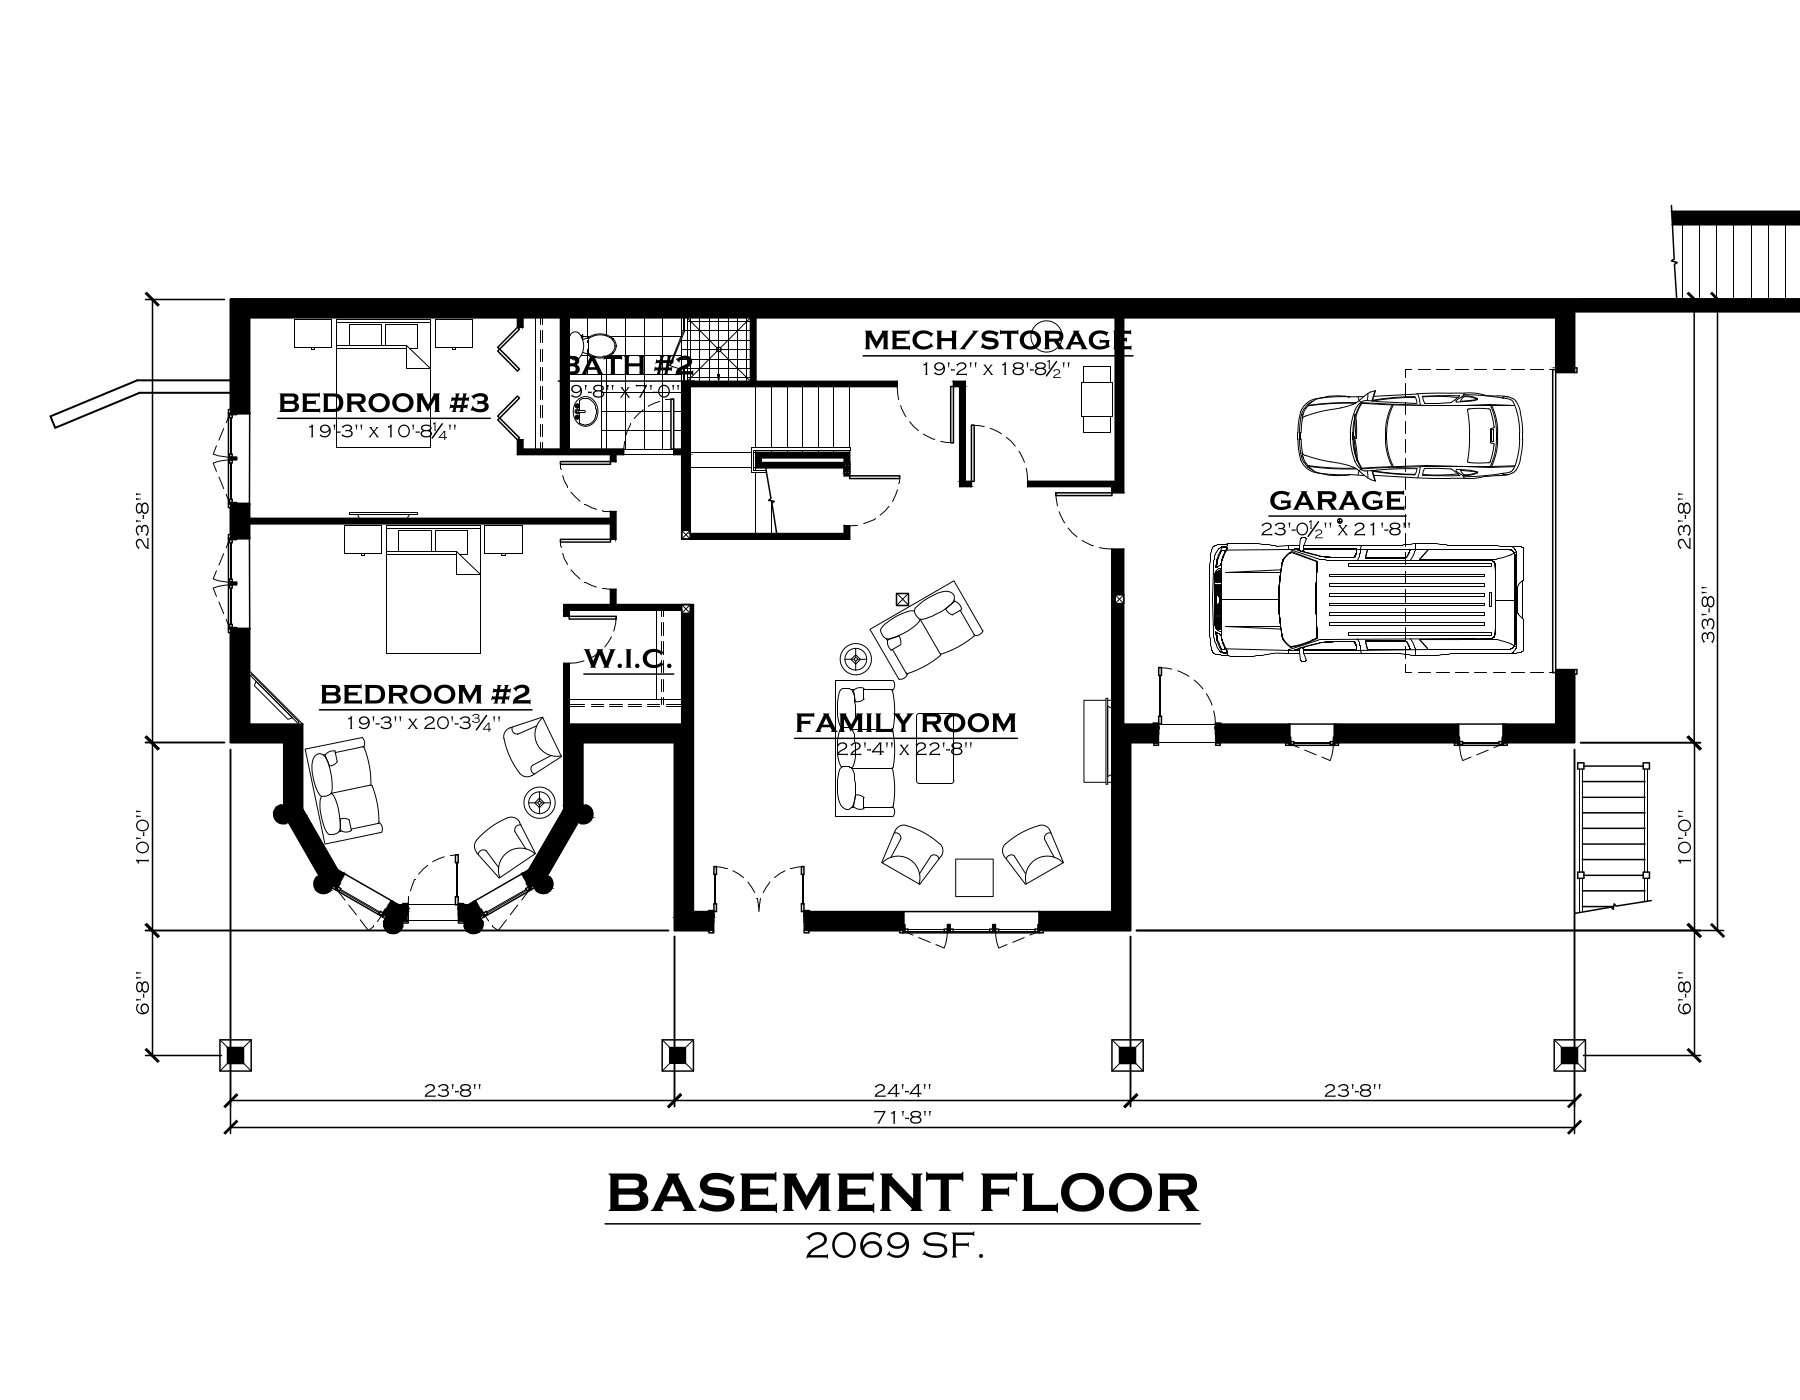 EverLog Systems the Clark Fork Basement Floor Plan